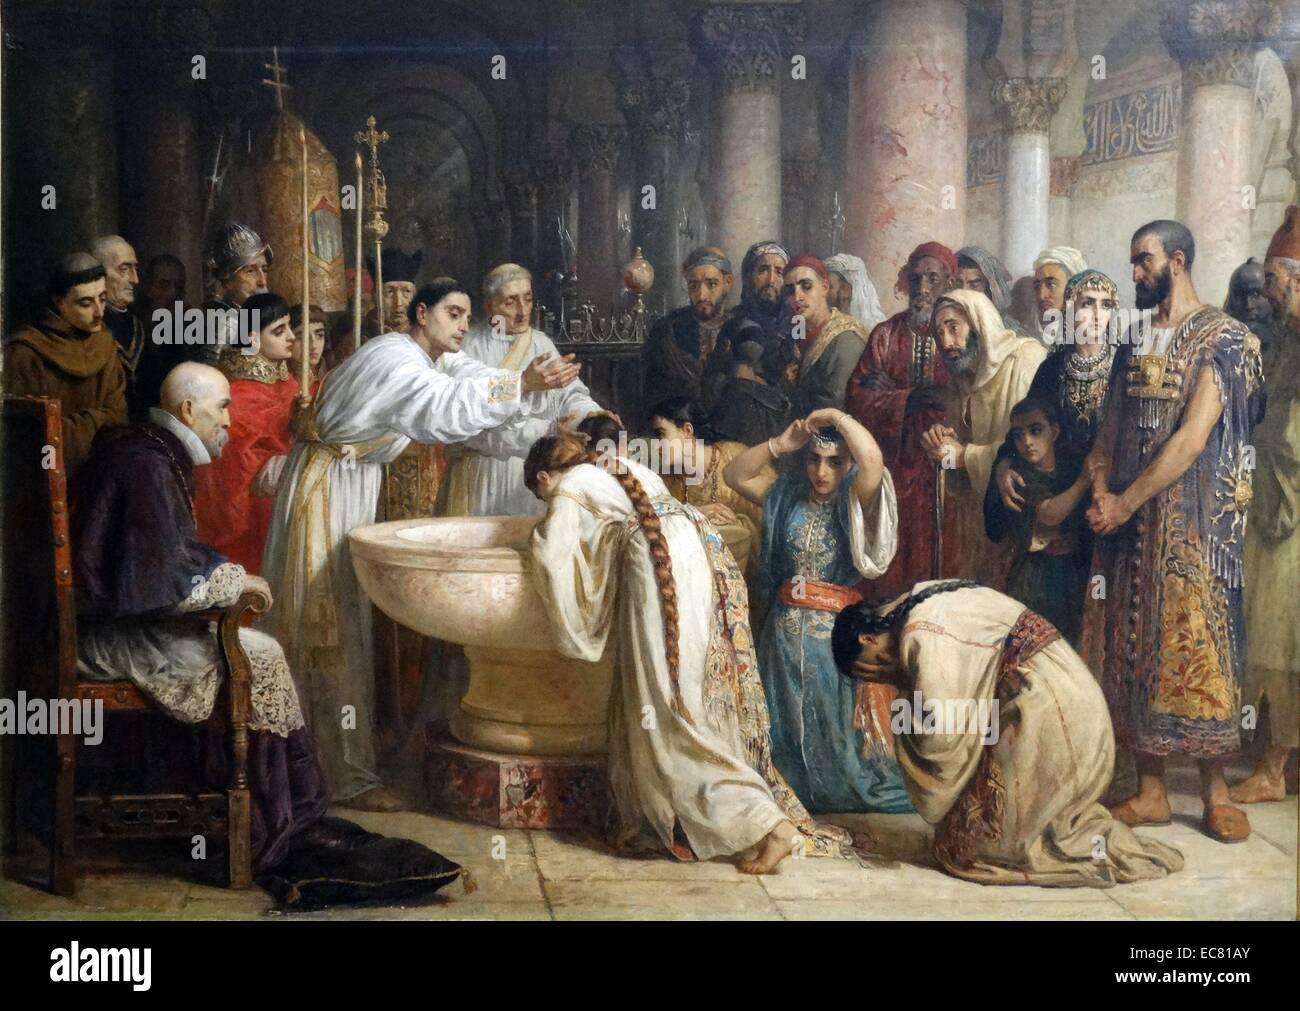 The Moorish Proselytes of Archbishop Ximenes at Granada, 1500 - Stock Image